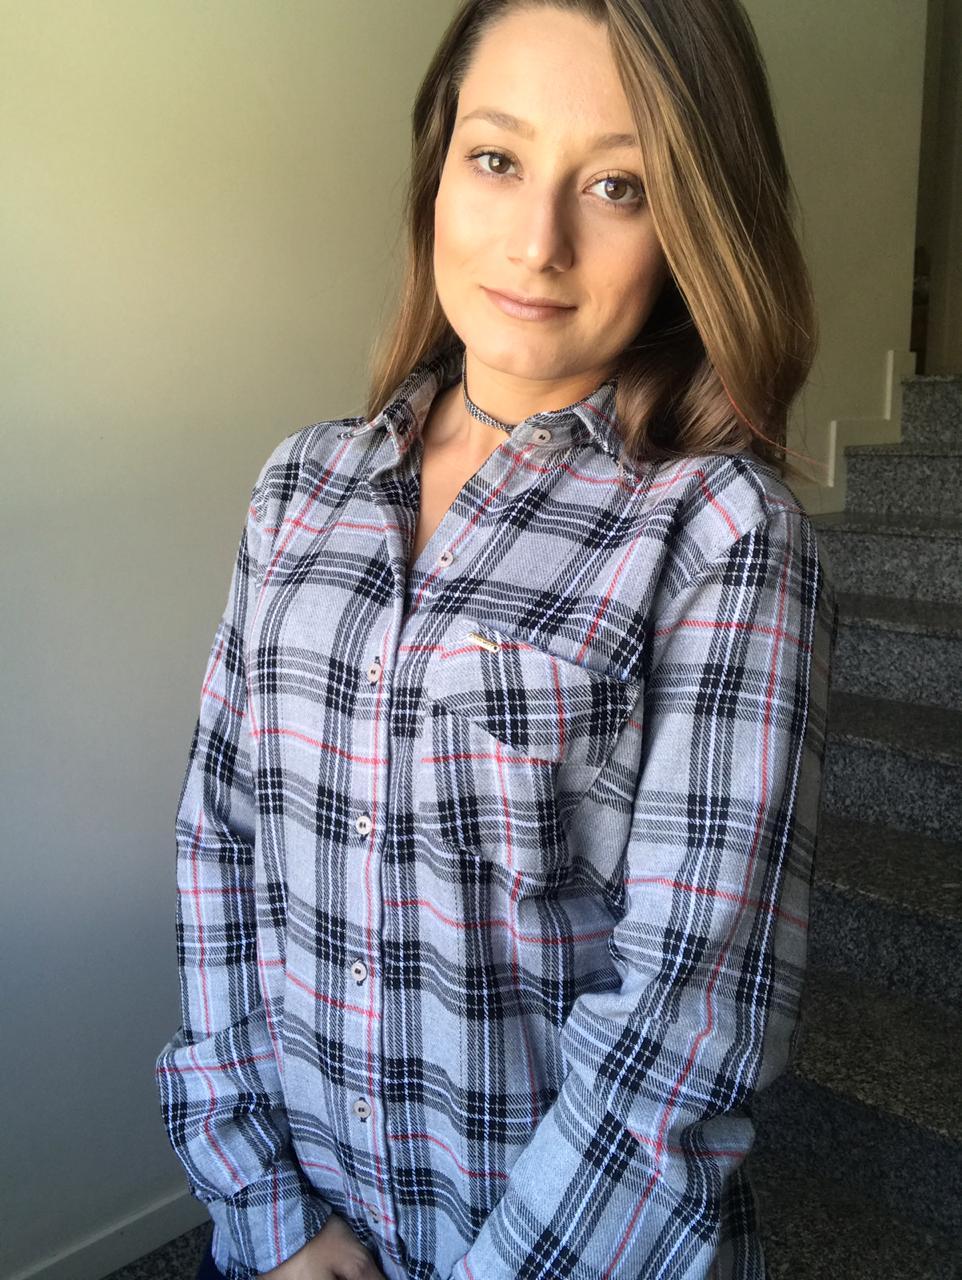 CAMISA FEMININA XADREZ CINZA MANGA LONGA camisa social feminina